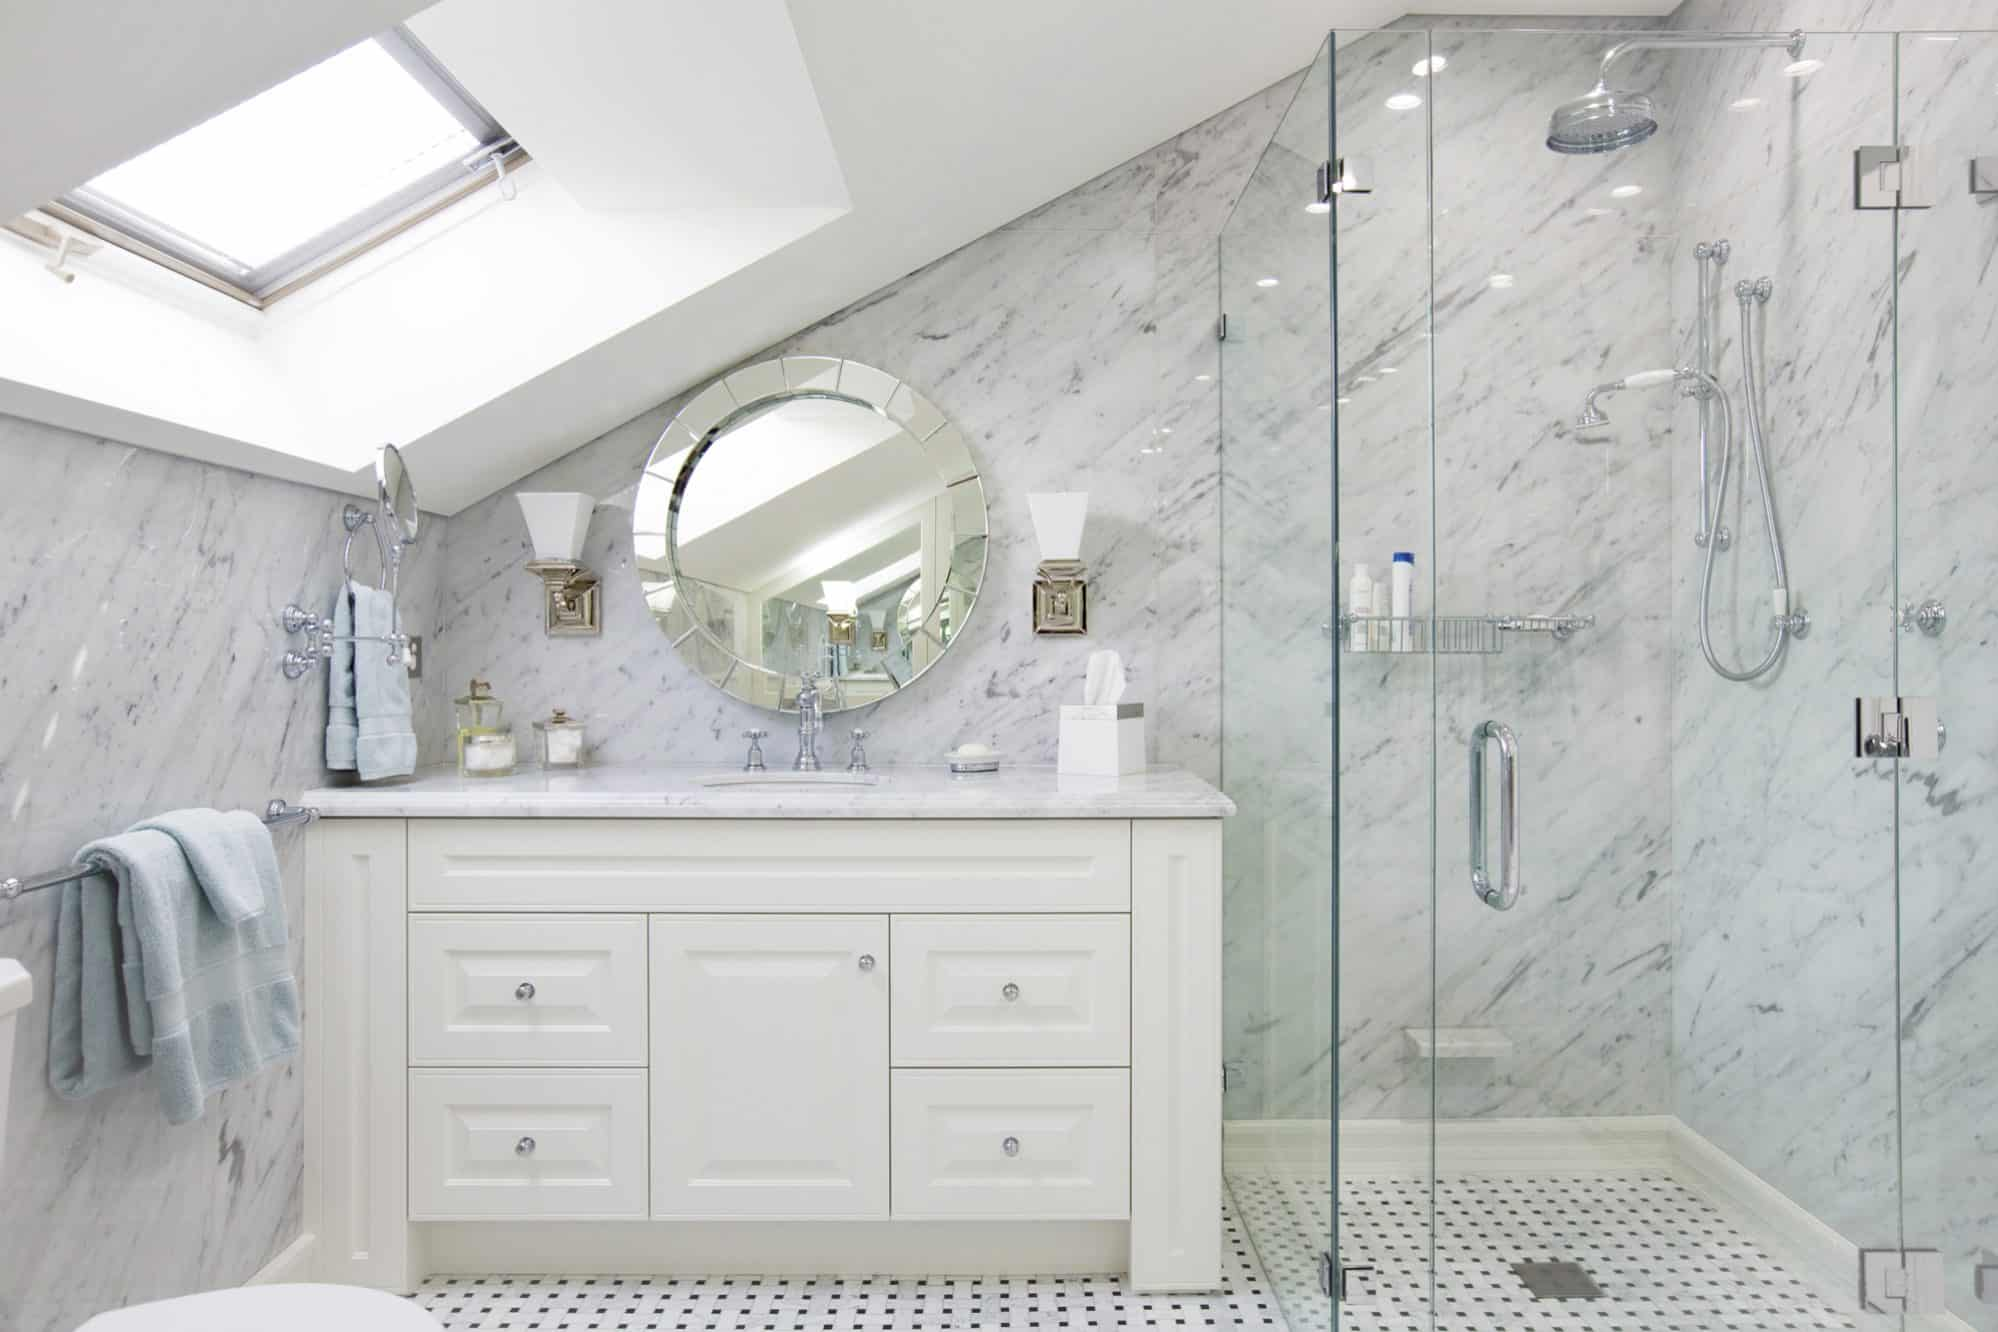 The Art Deco master bathroom